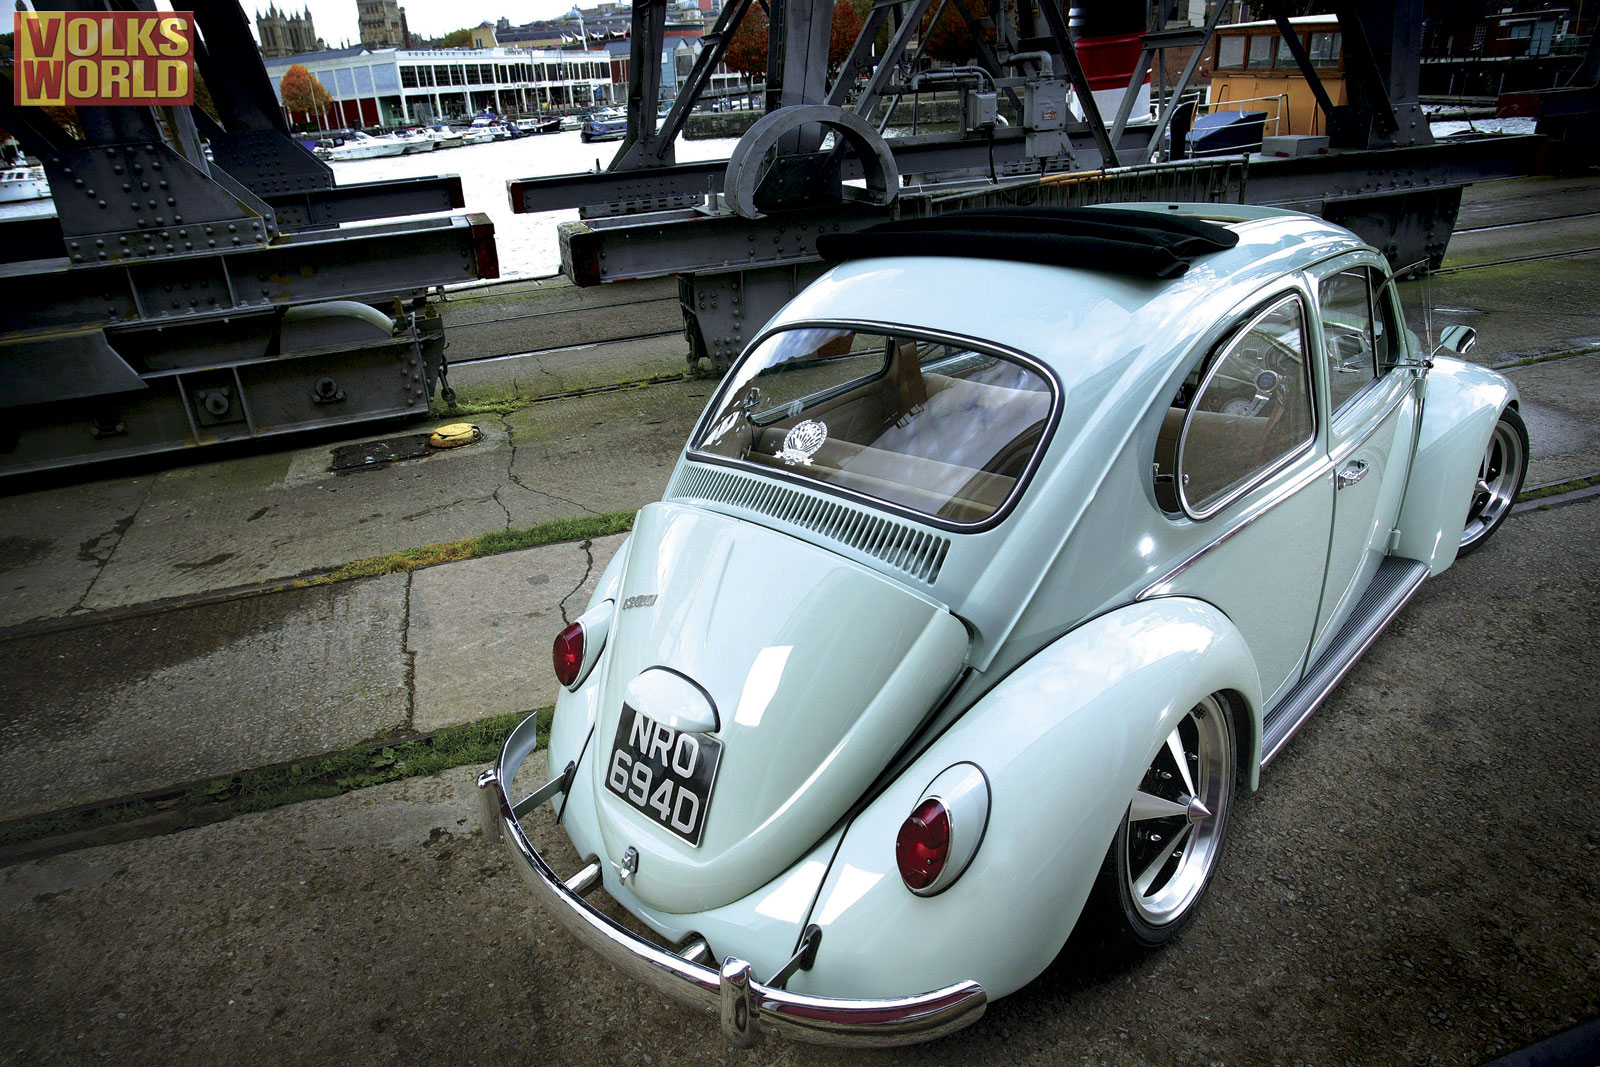 vw beetle volkswagen beetle 23460456 1600 1067jpg 1600x1067